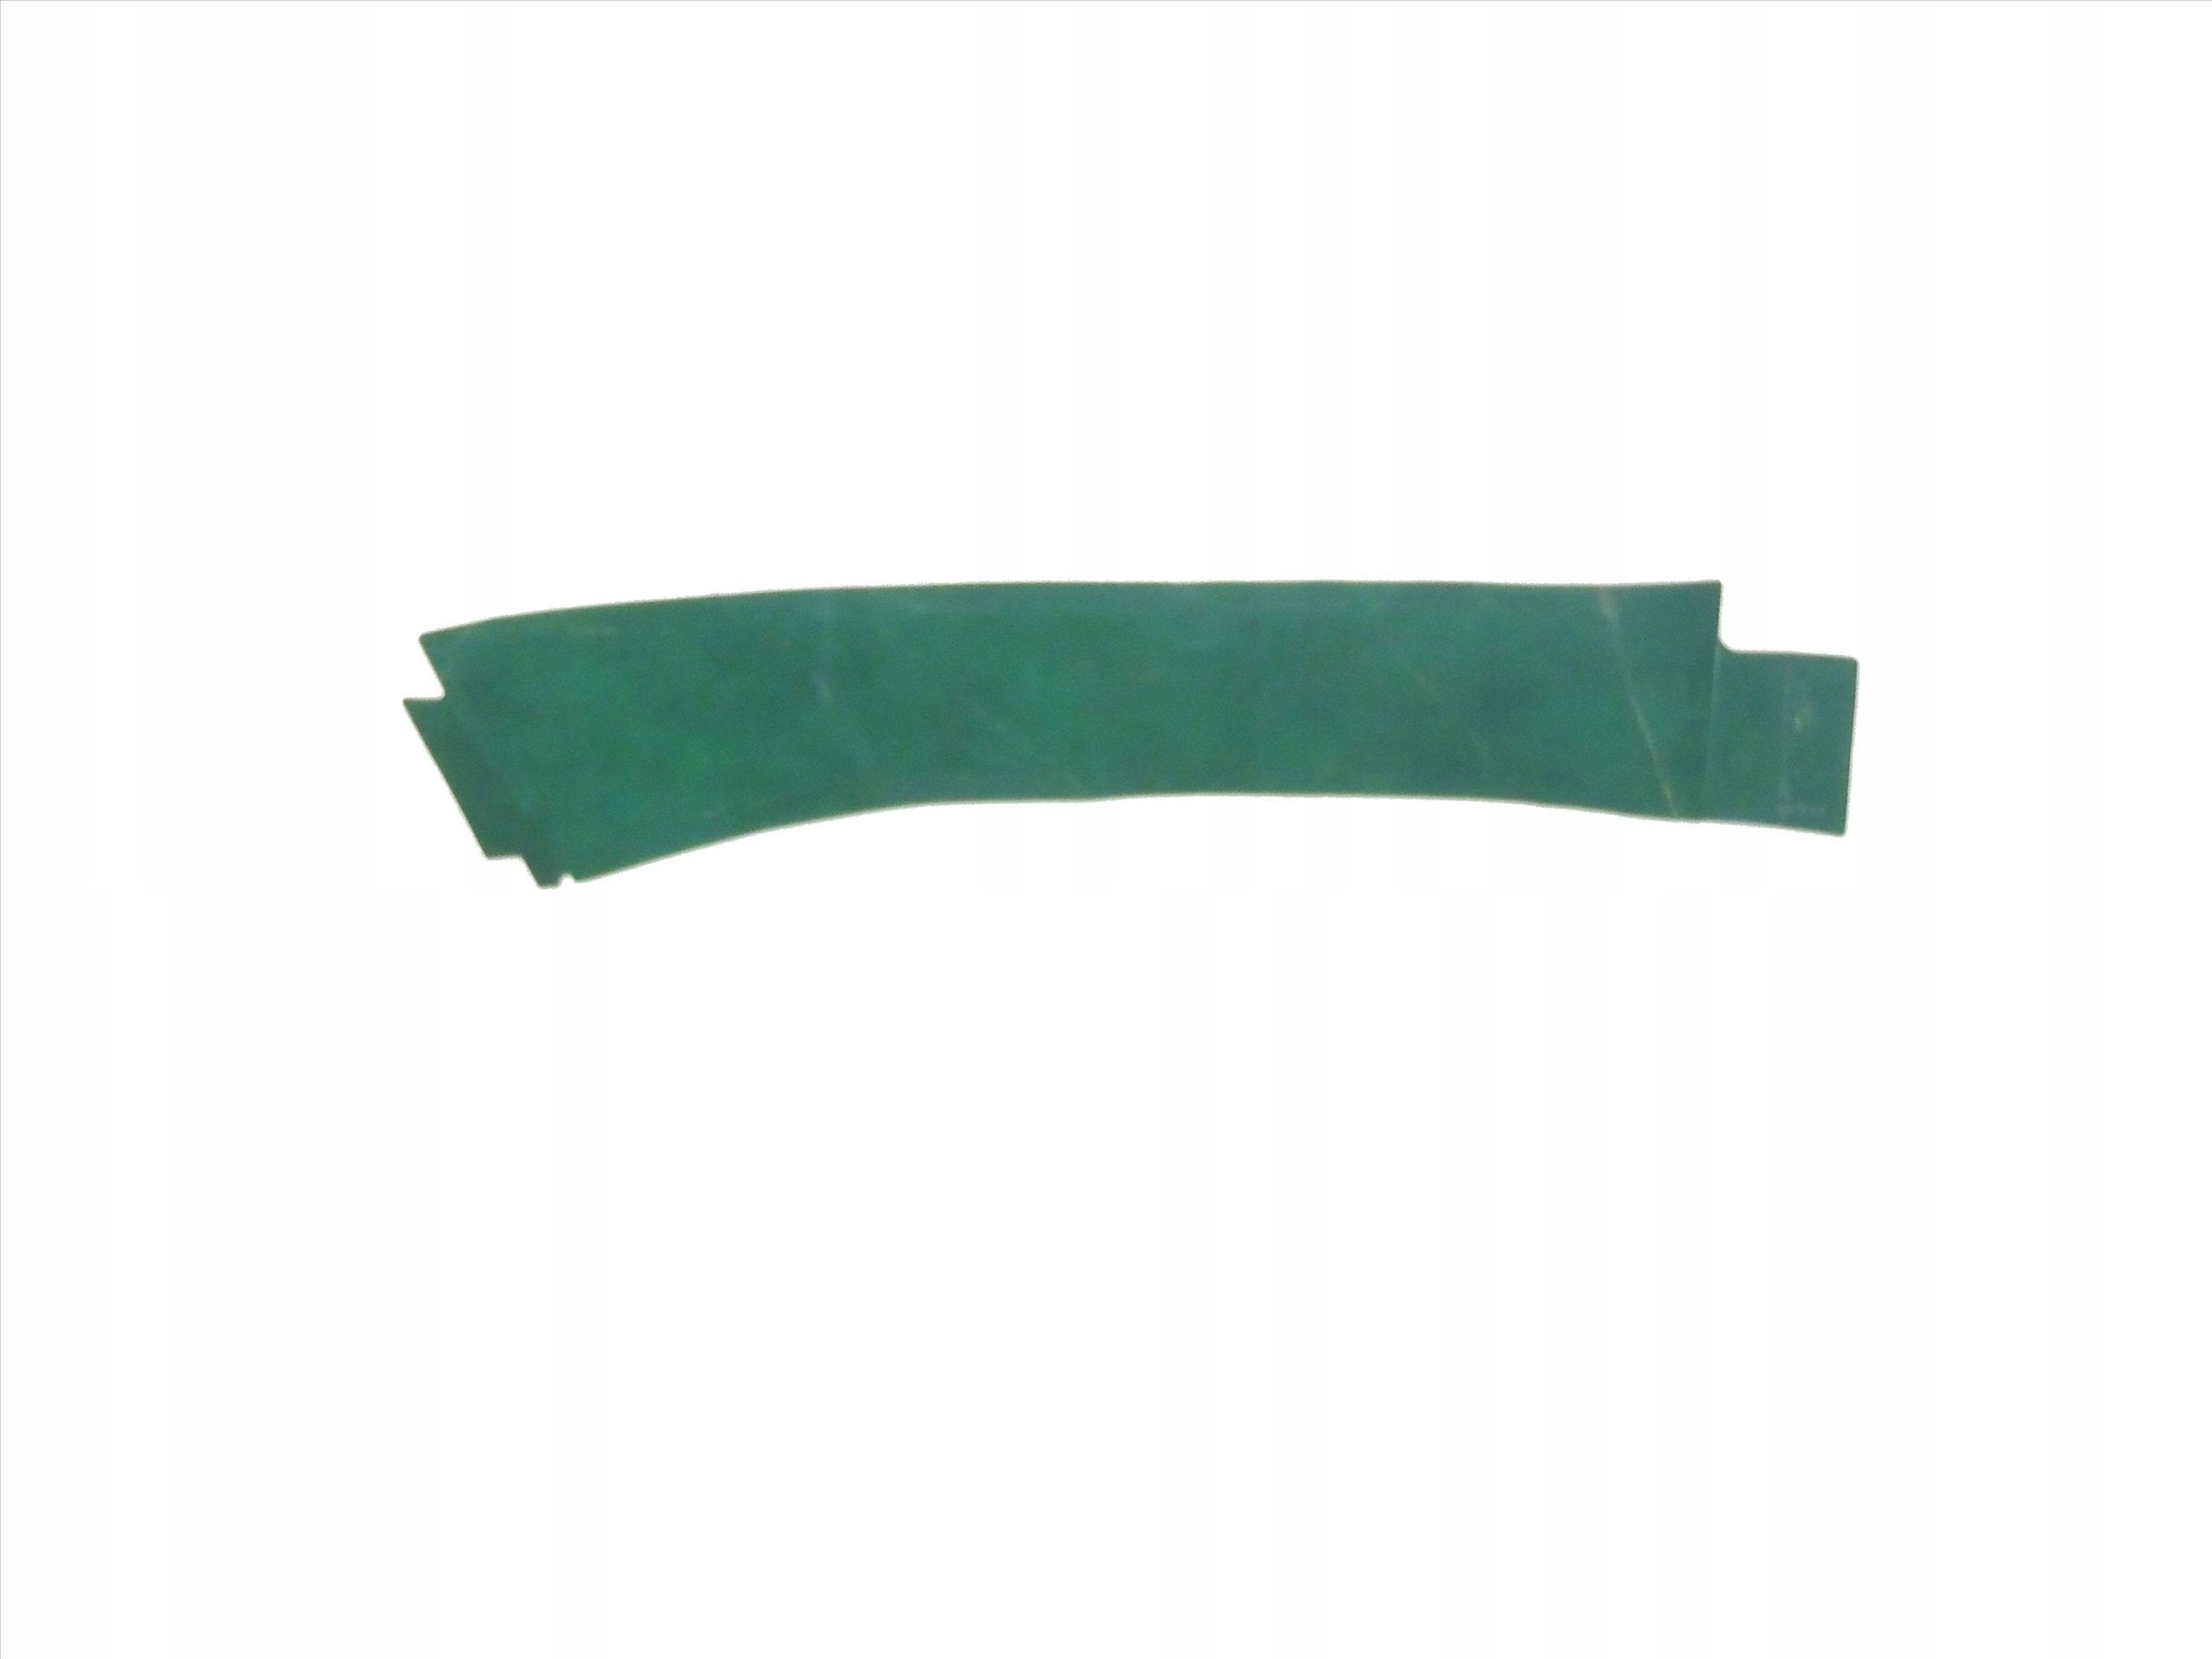 lexus ct200h 10-20 пленка защитная наклейка локер колесной арки